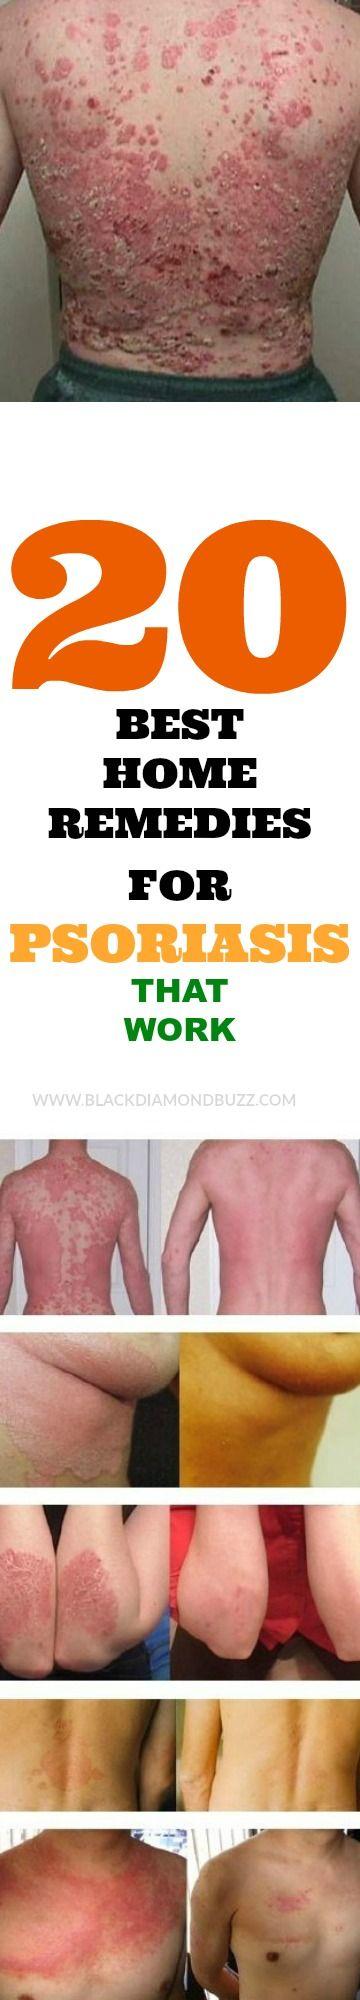 20 Best  Home Remedies For Psoriasis That Work.   #Psoriasisdiet #psoriasis #scalpposriasis #healingporiasis #homeremedies #naturalremedies #alternativemedicine